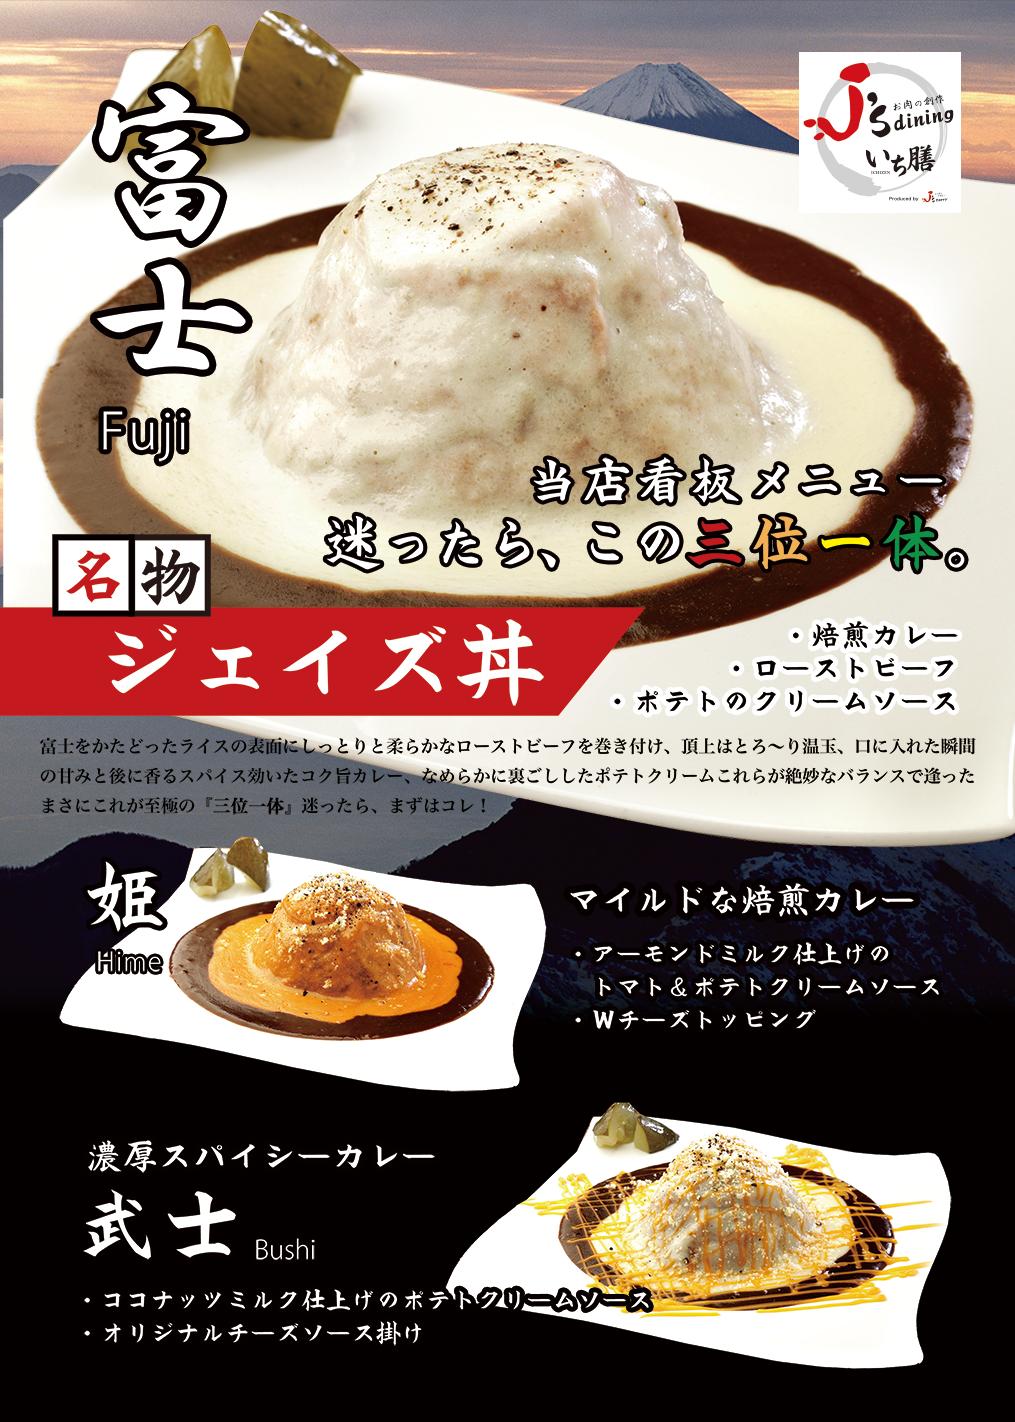 JSカレーA4開店記念チラシ(裏)2